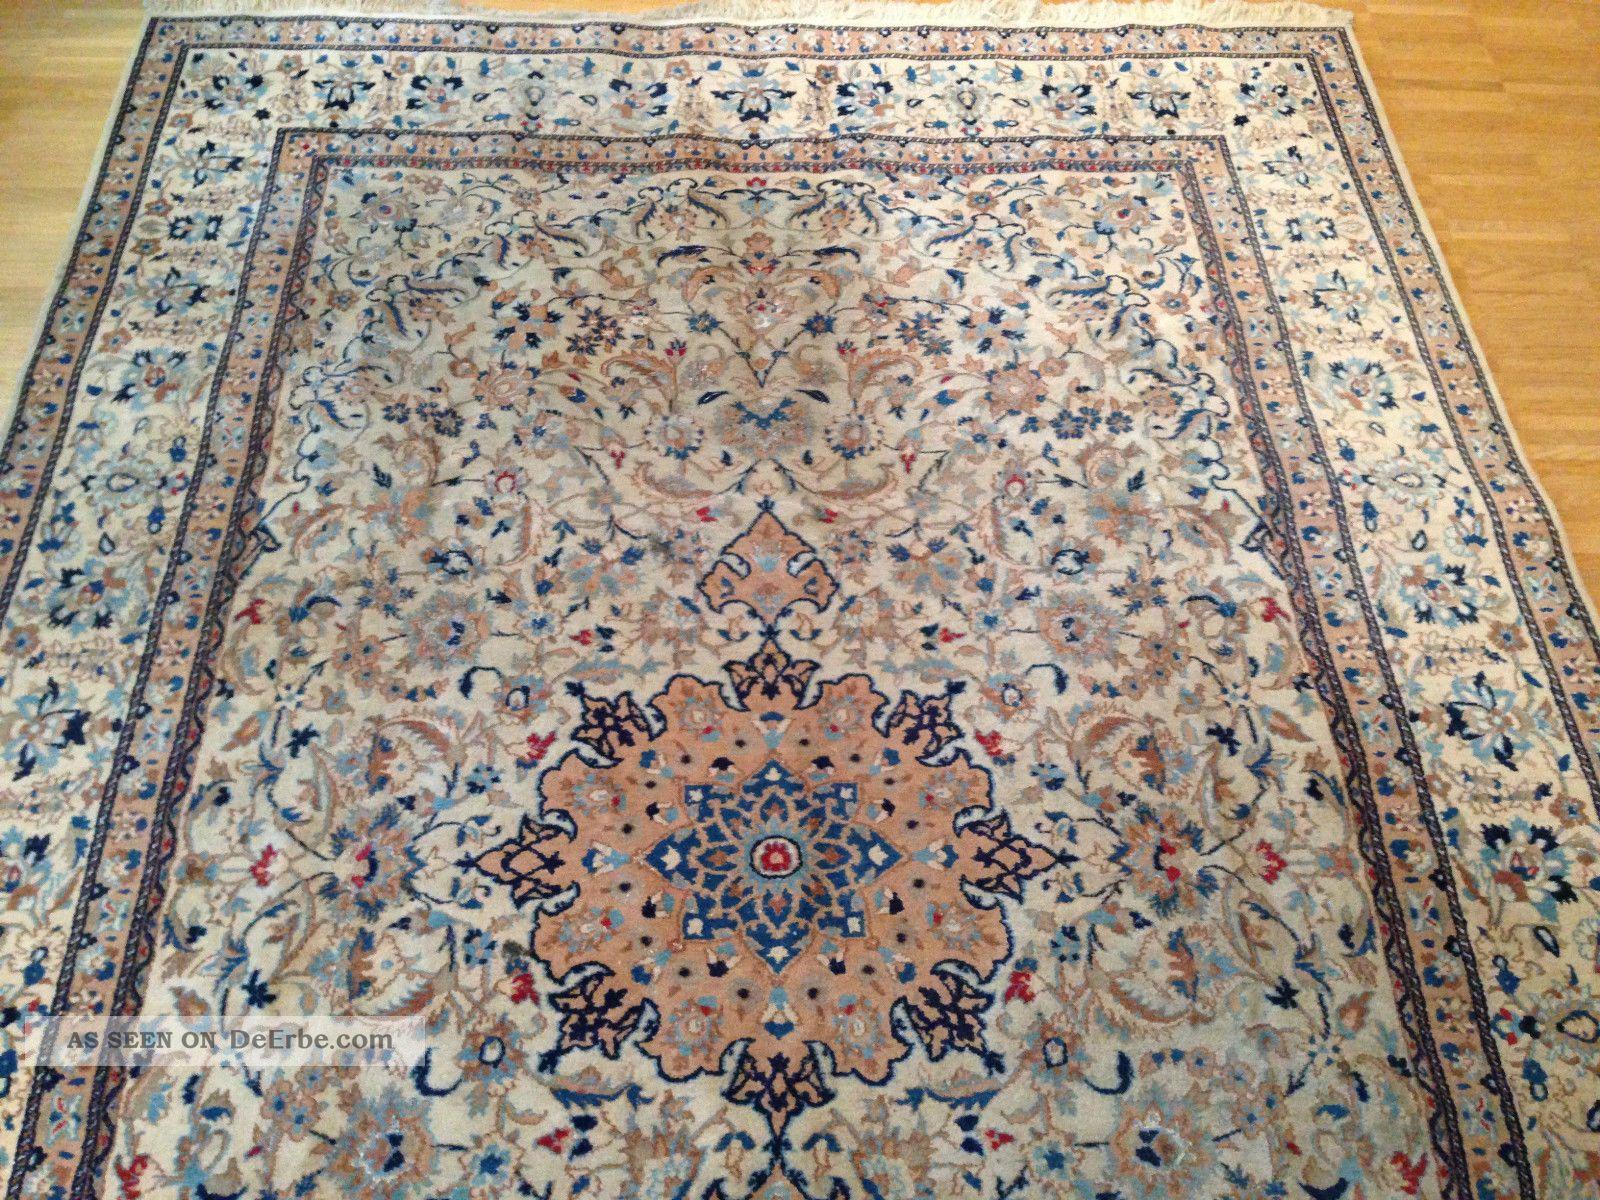 teppich handgekn pft orient royal 265x172 cm carpet tappeto tapis. Black Bedroom Furniture Sets. Home Design Ideas